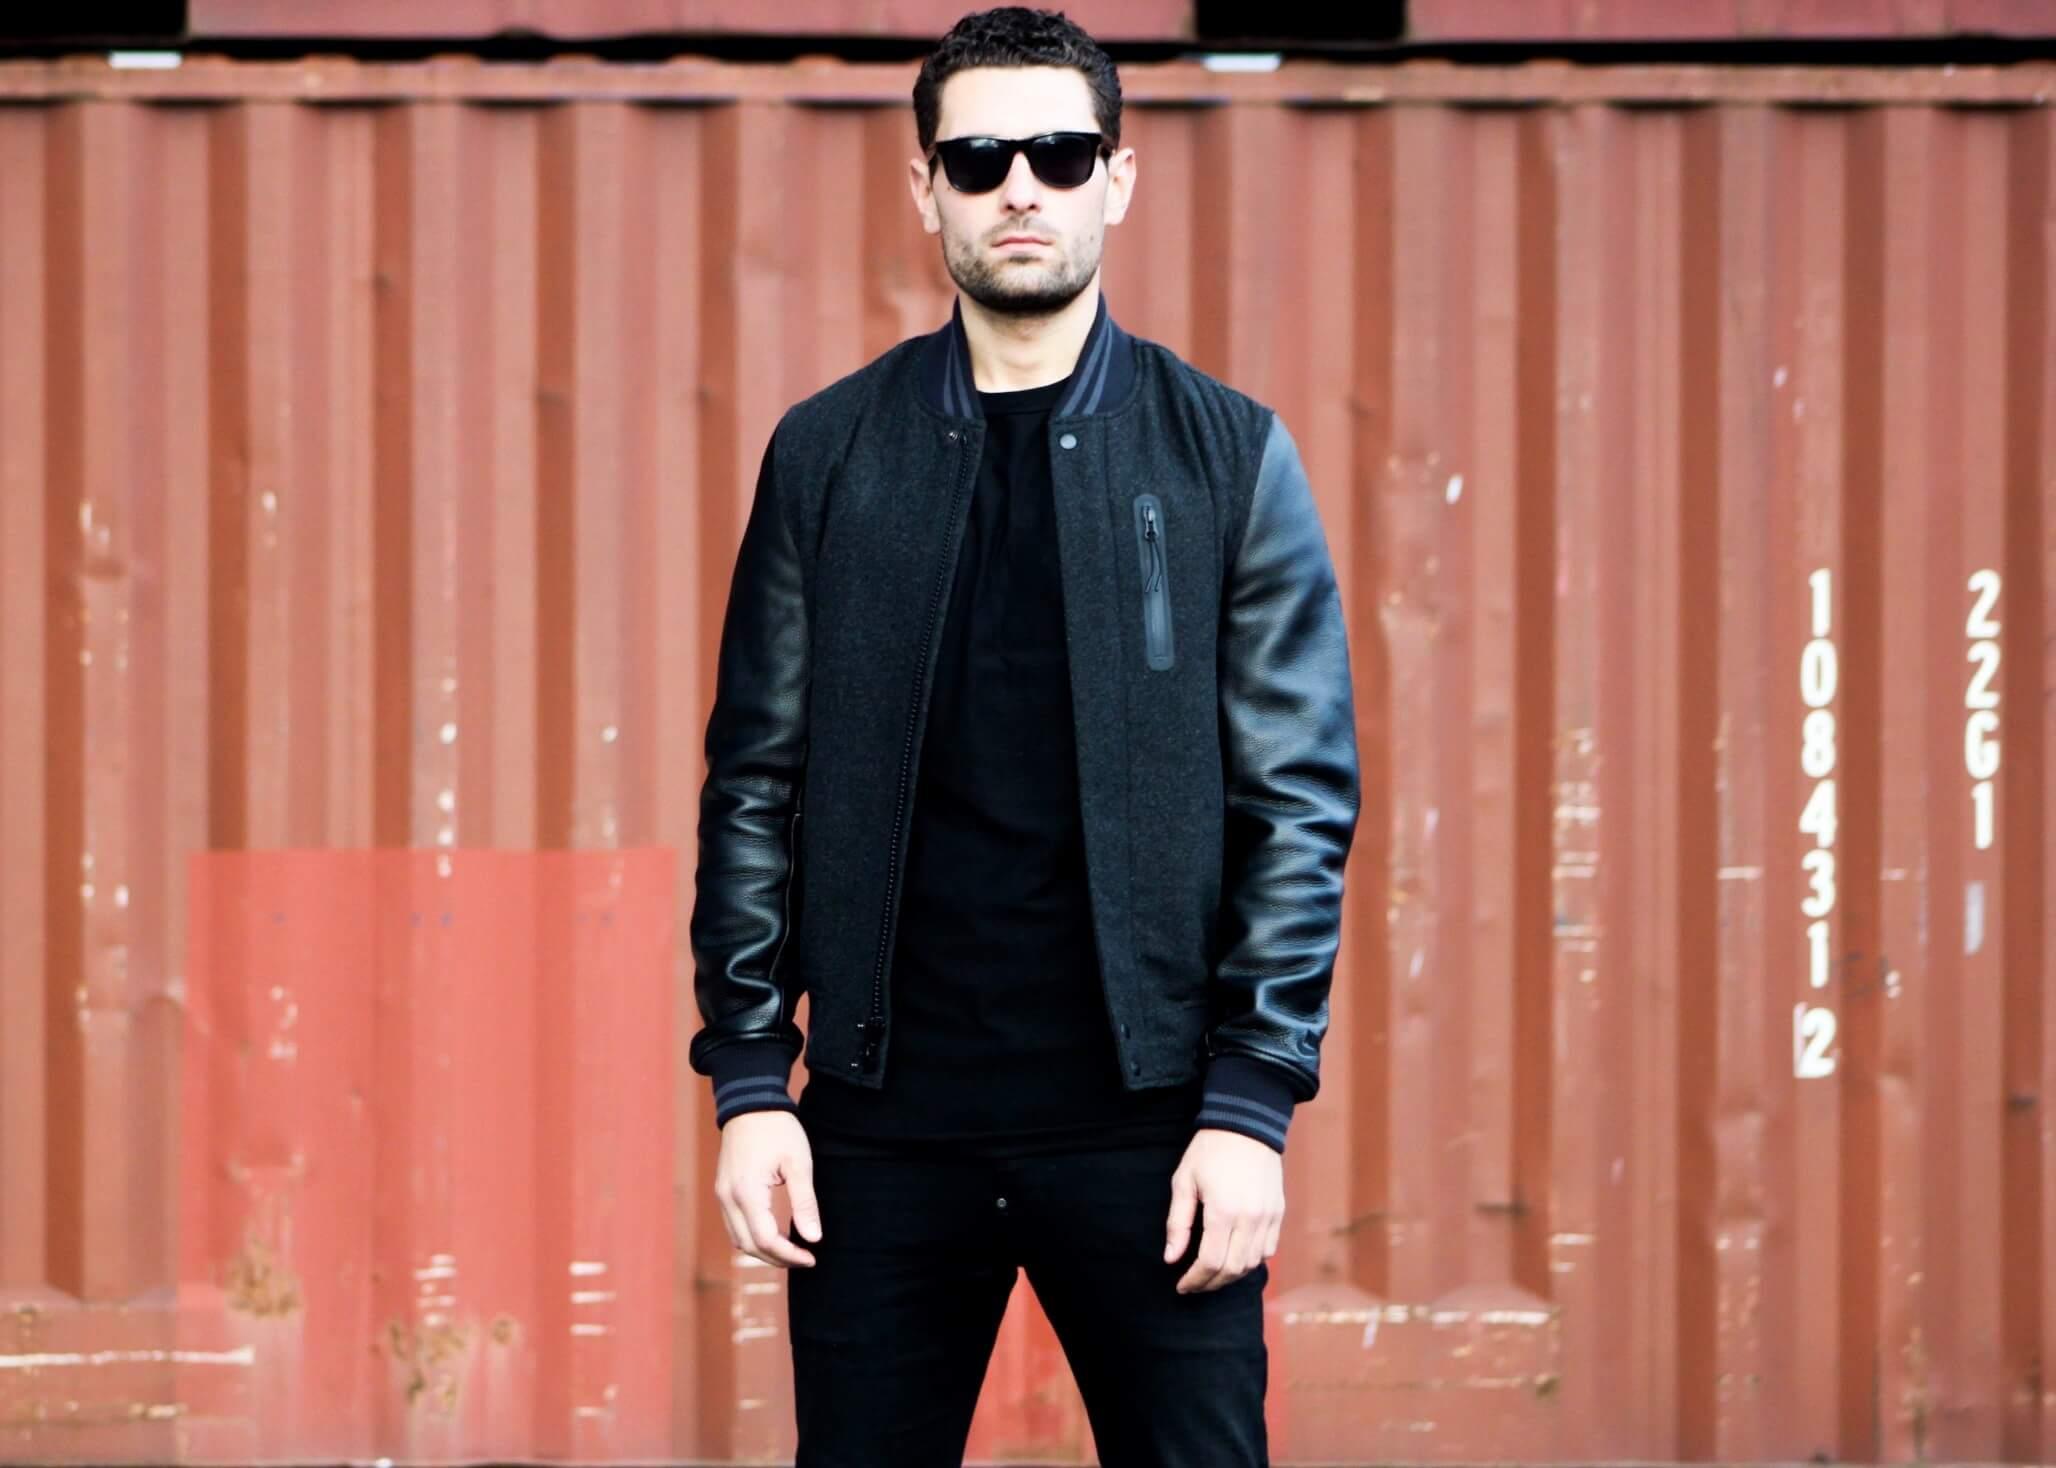 Interprete Precioso Cornualles  Nike Destroyer Jacket Black Black - 545942-032